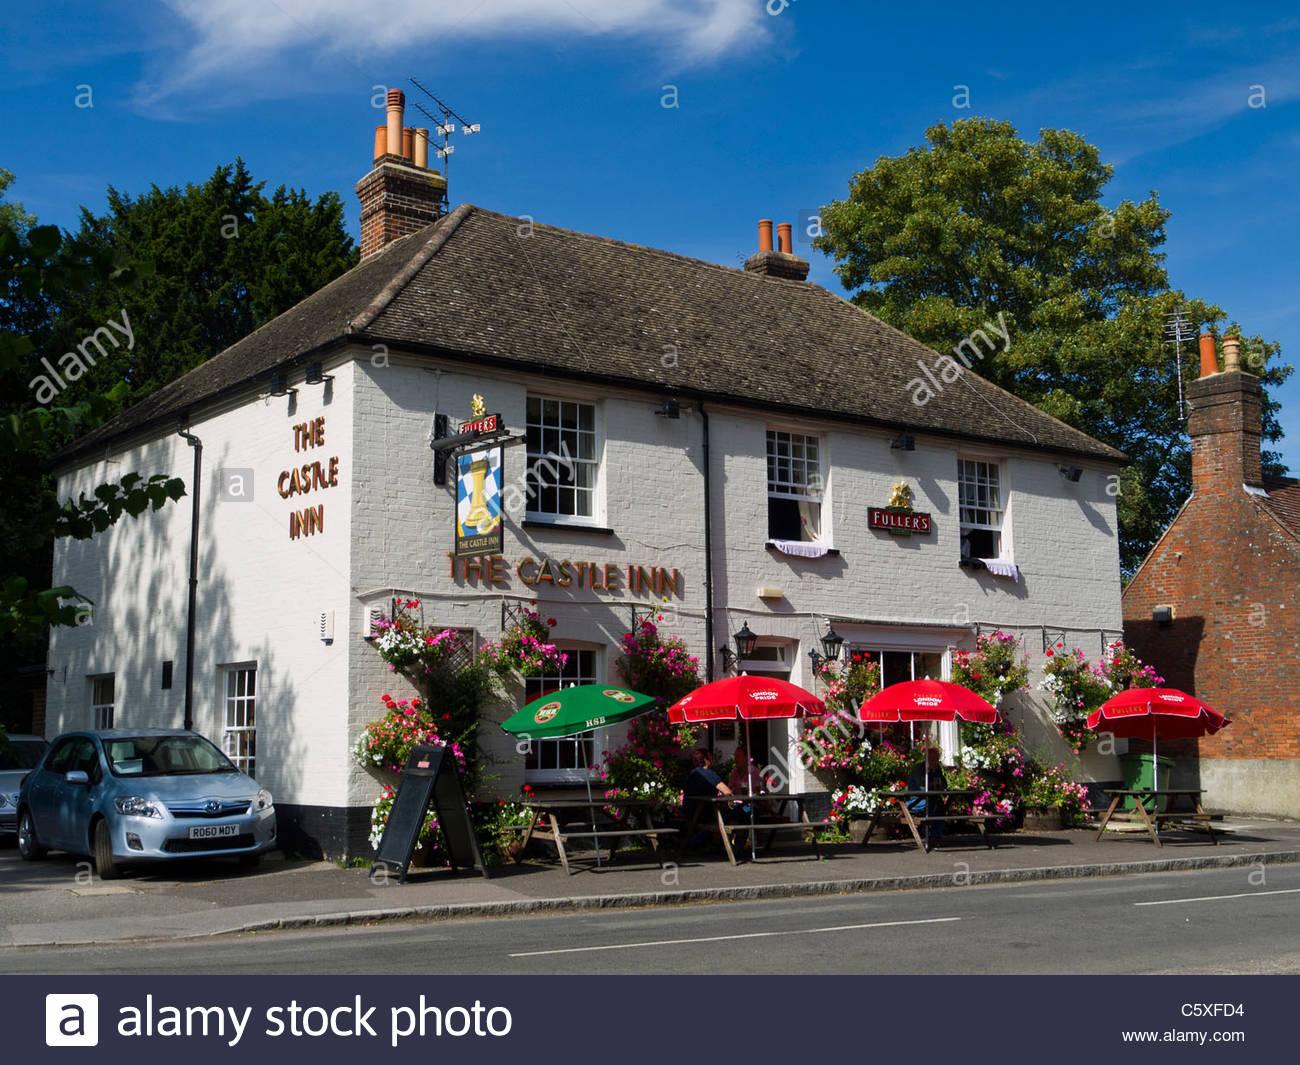 The Castle Inn Pub Rowlands Castle Hampshire England - Stock Image